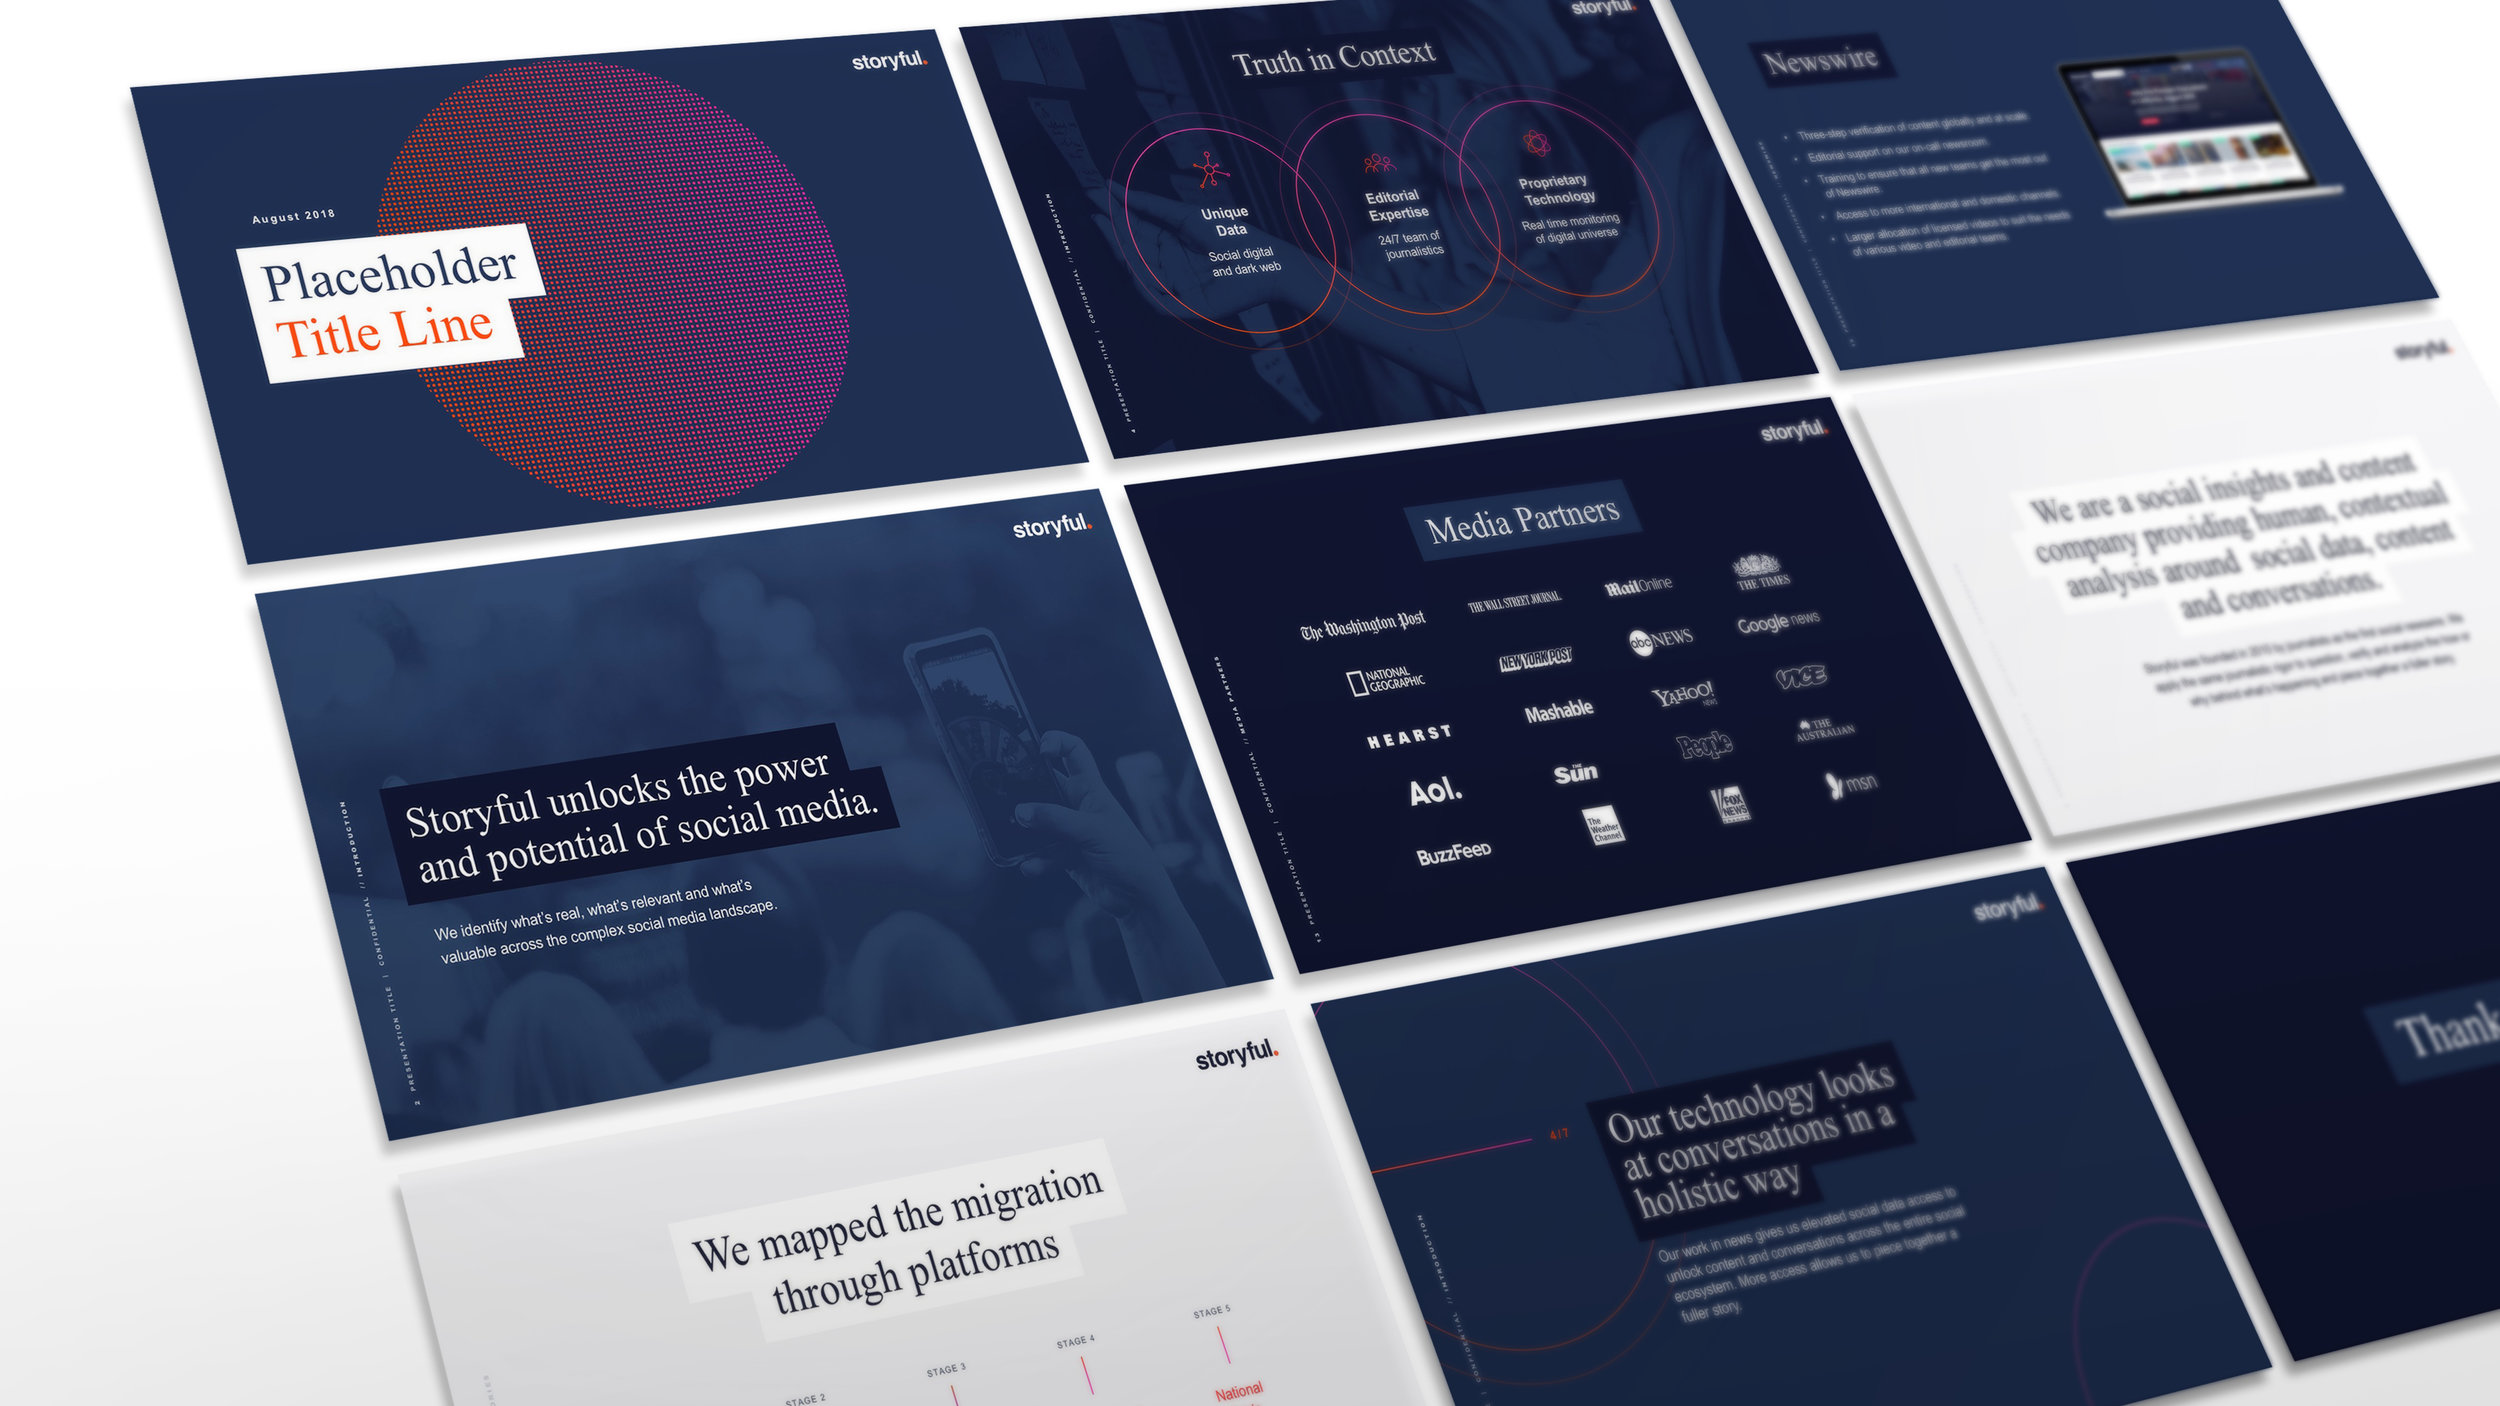 storyful-brand-presentation-deck-mockup3.jpg